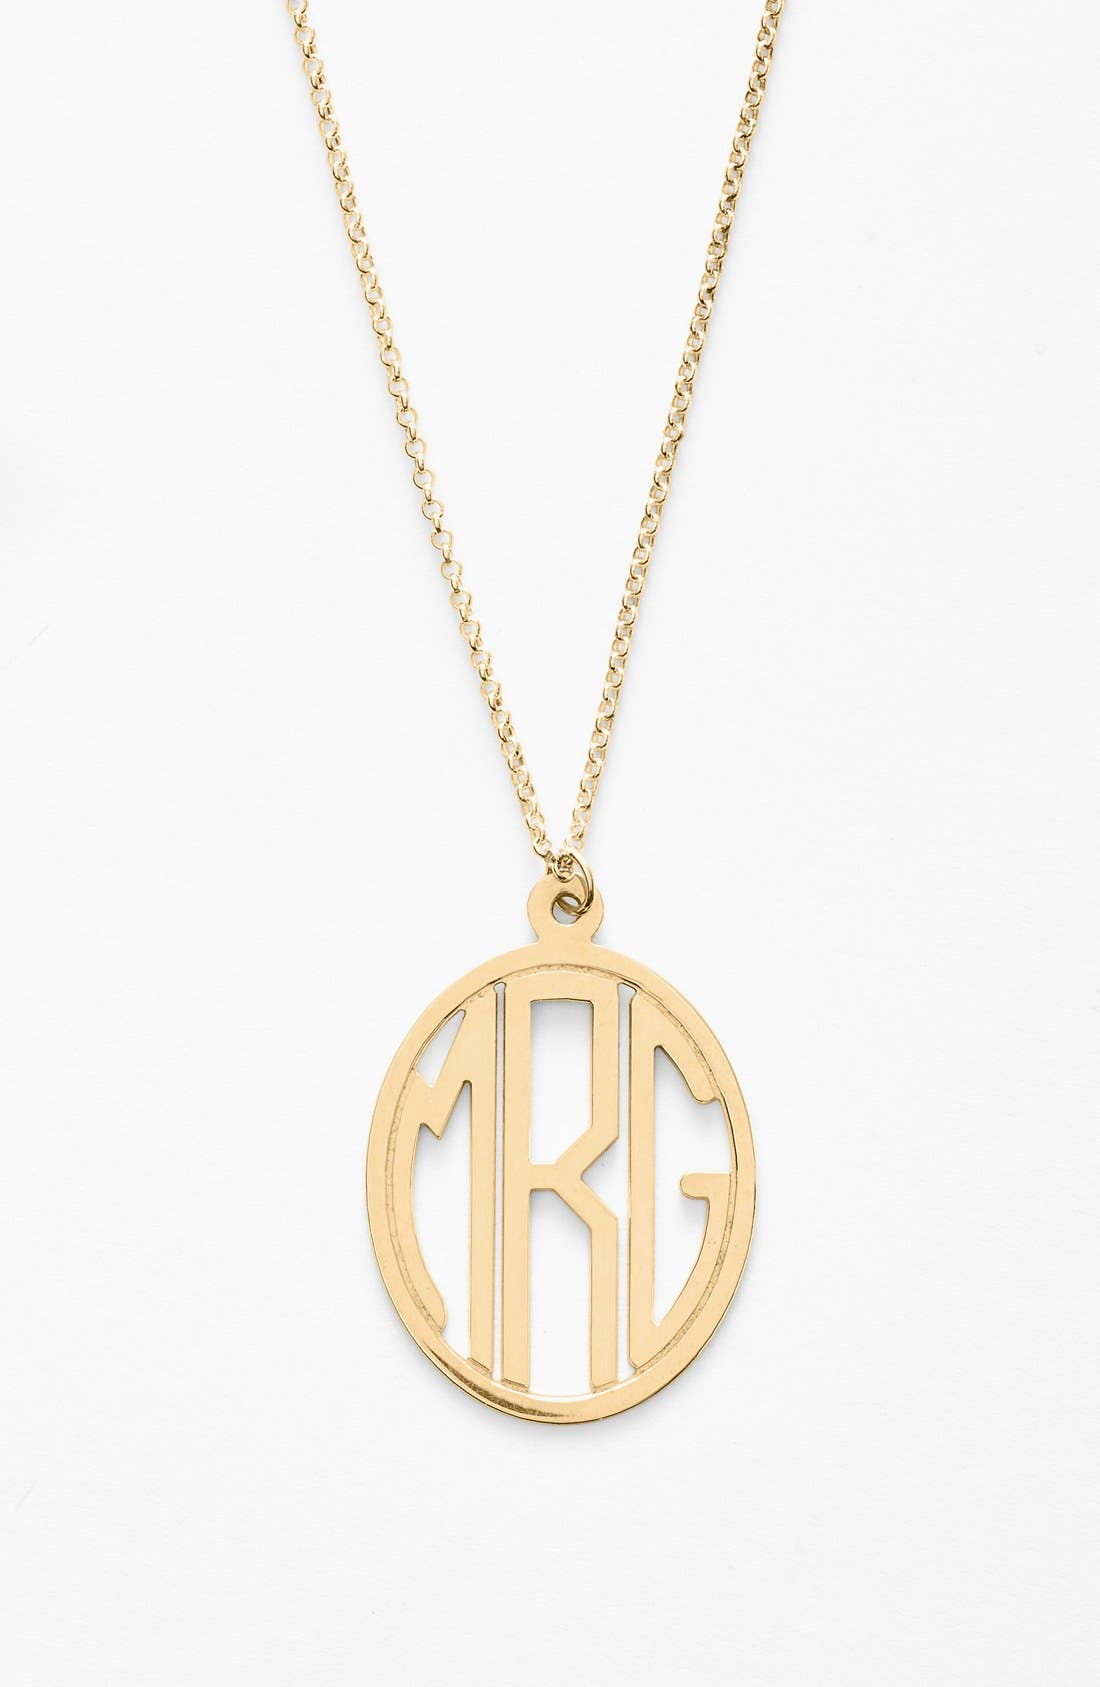 Personalized Monogram Pendant Necklace,                             Alternate thumbnail 2, color,                             GOLD